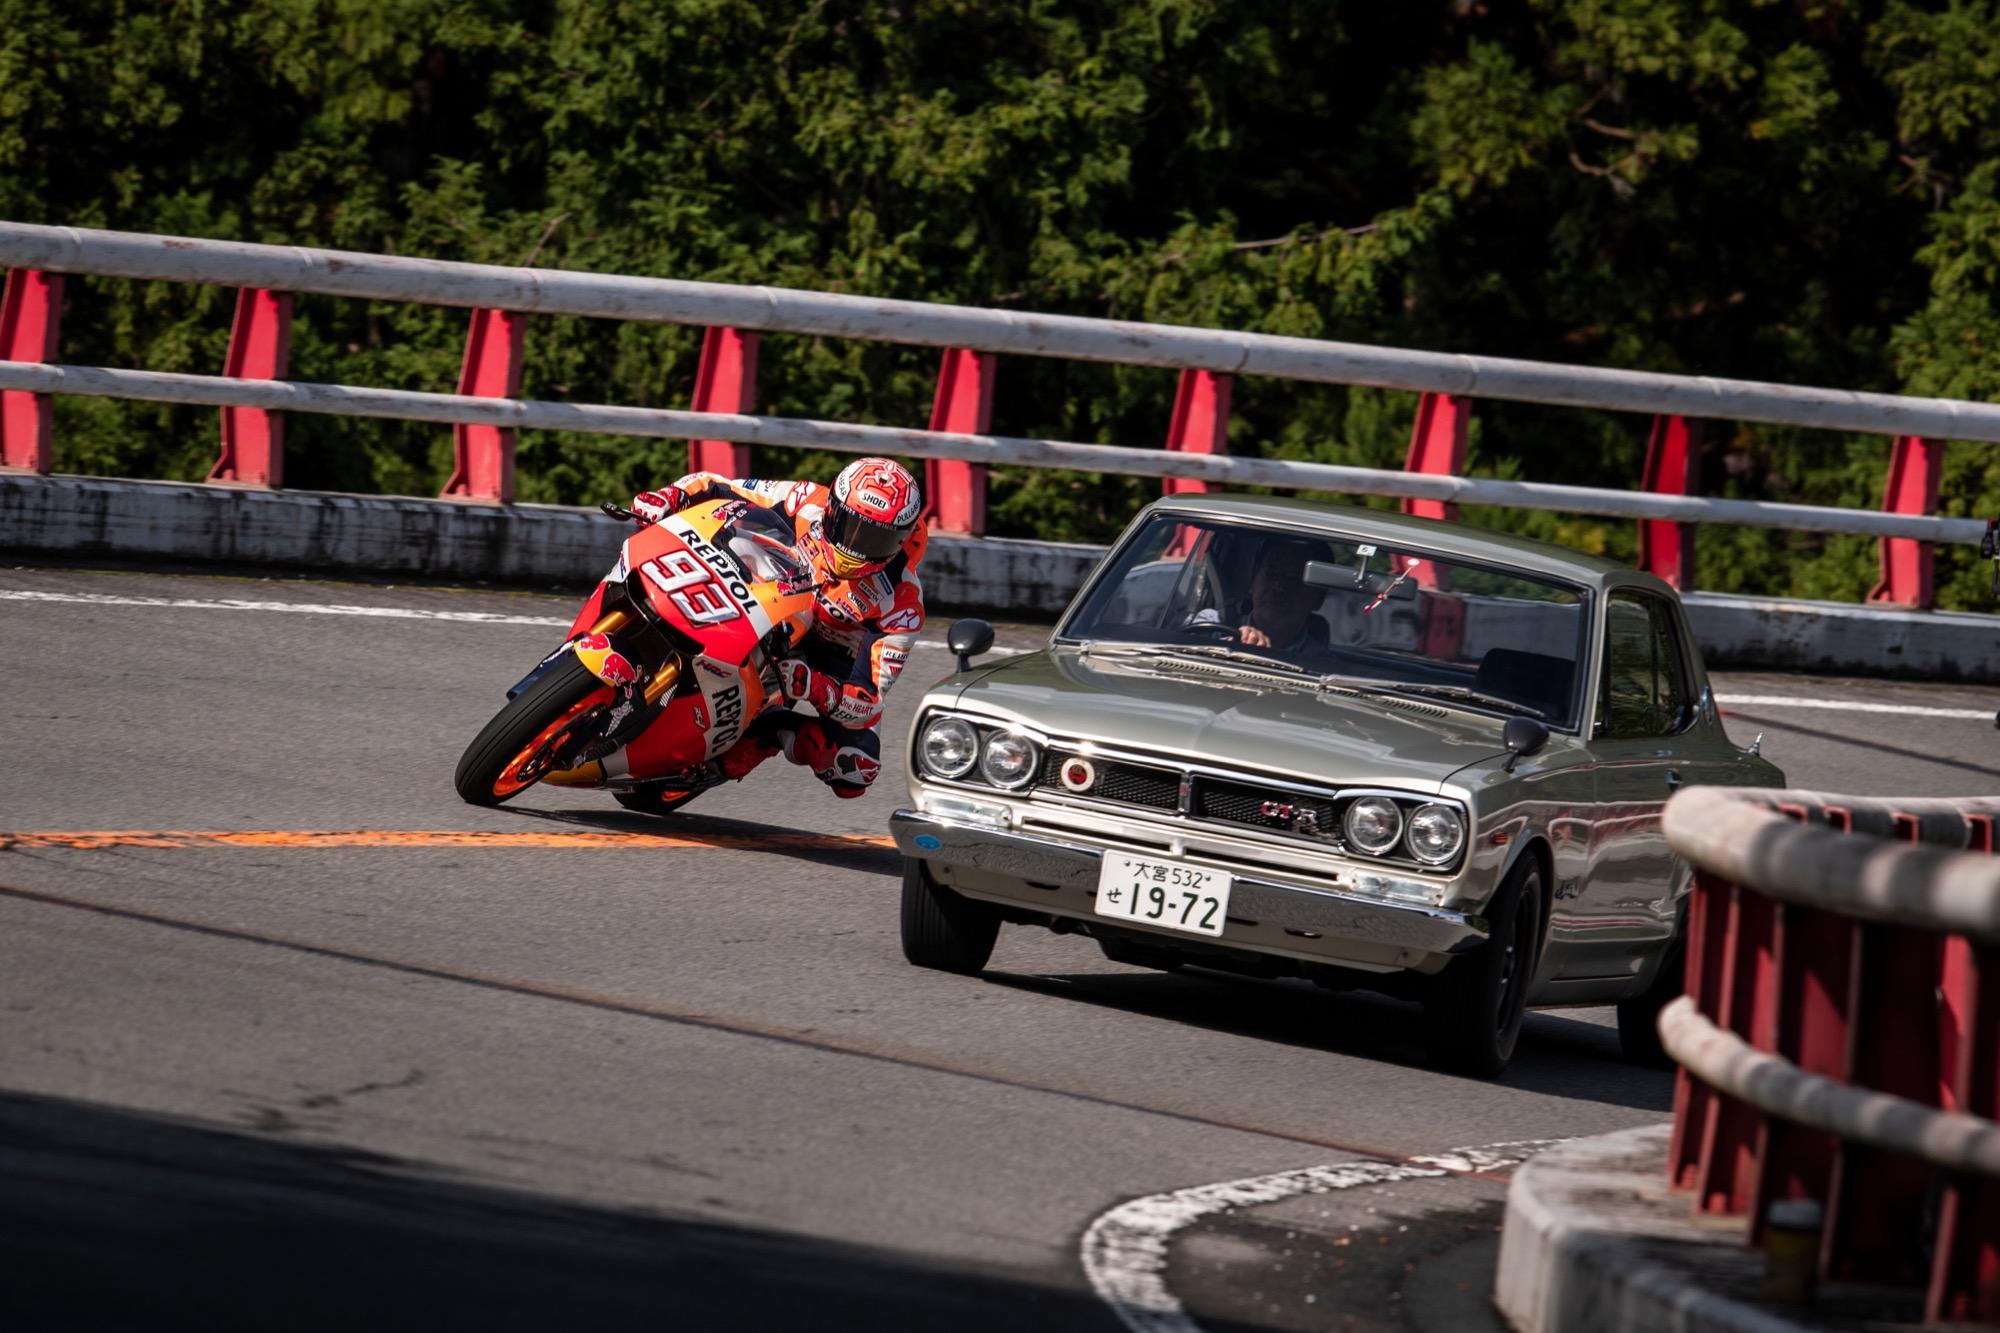 El épico vídeo de Marc Márquez en Hakone Turnpike